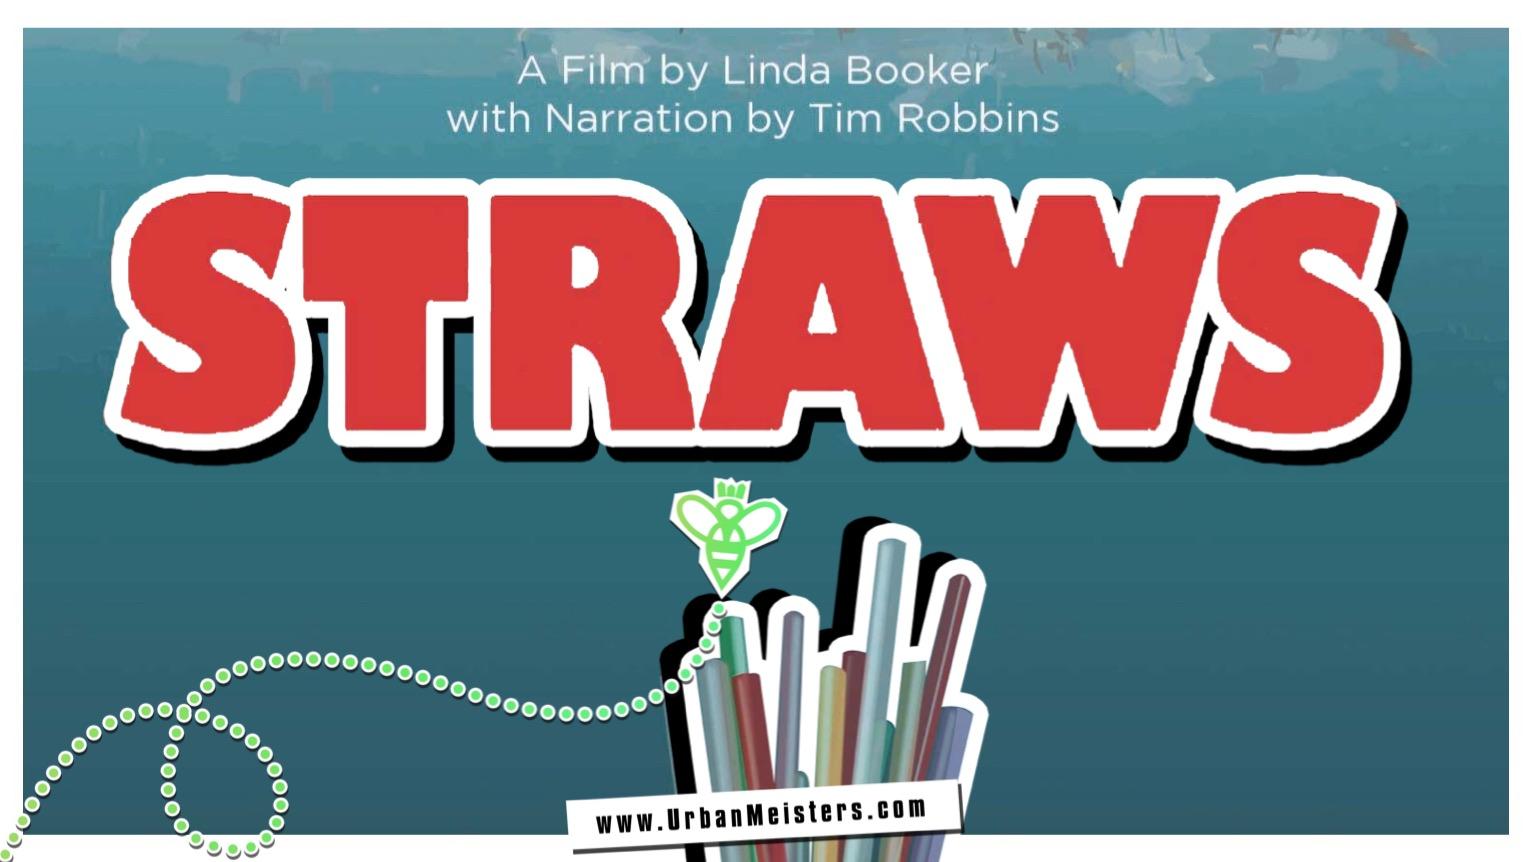 [EXCLUSIVE] Award winning filmmaker Linda Booker of Straws on ocean plastic